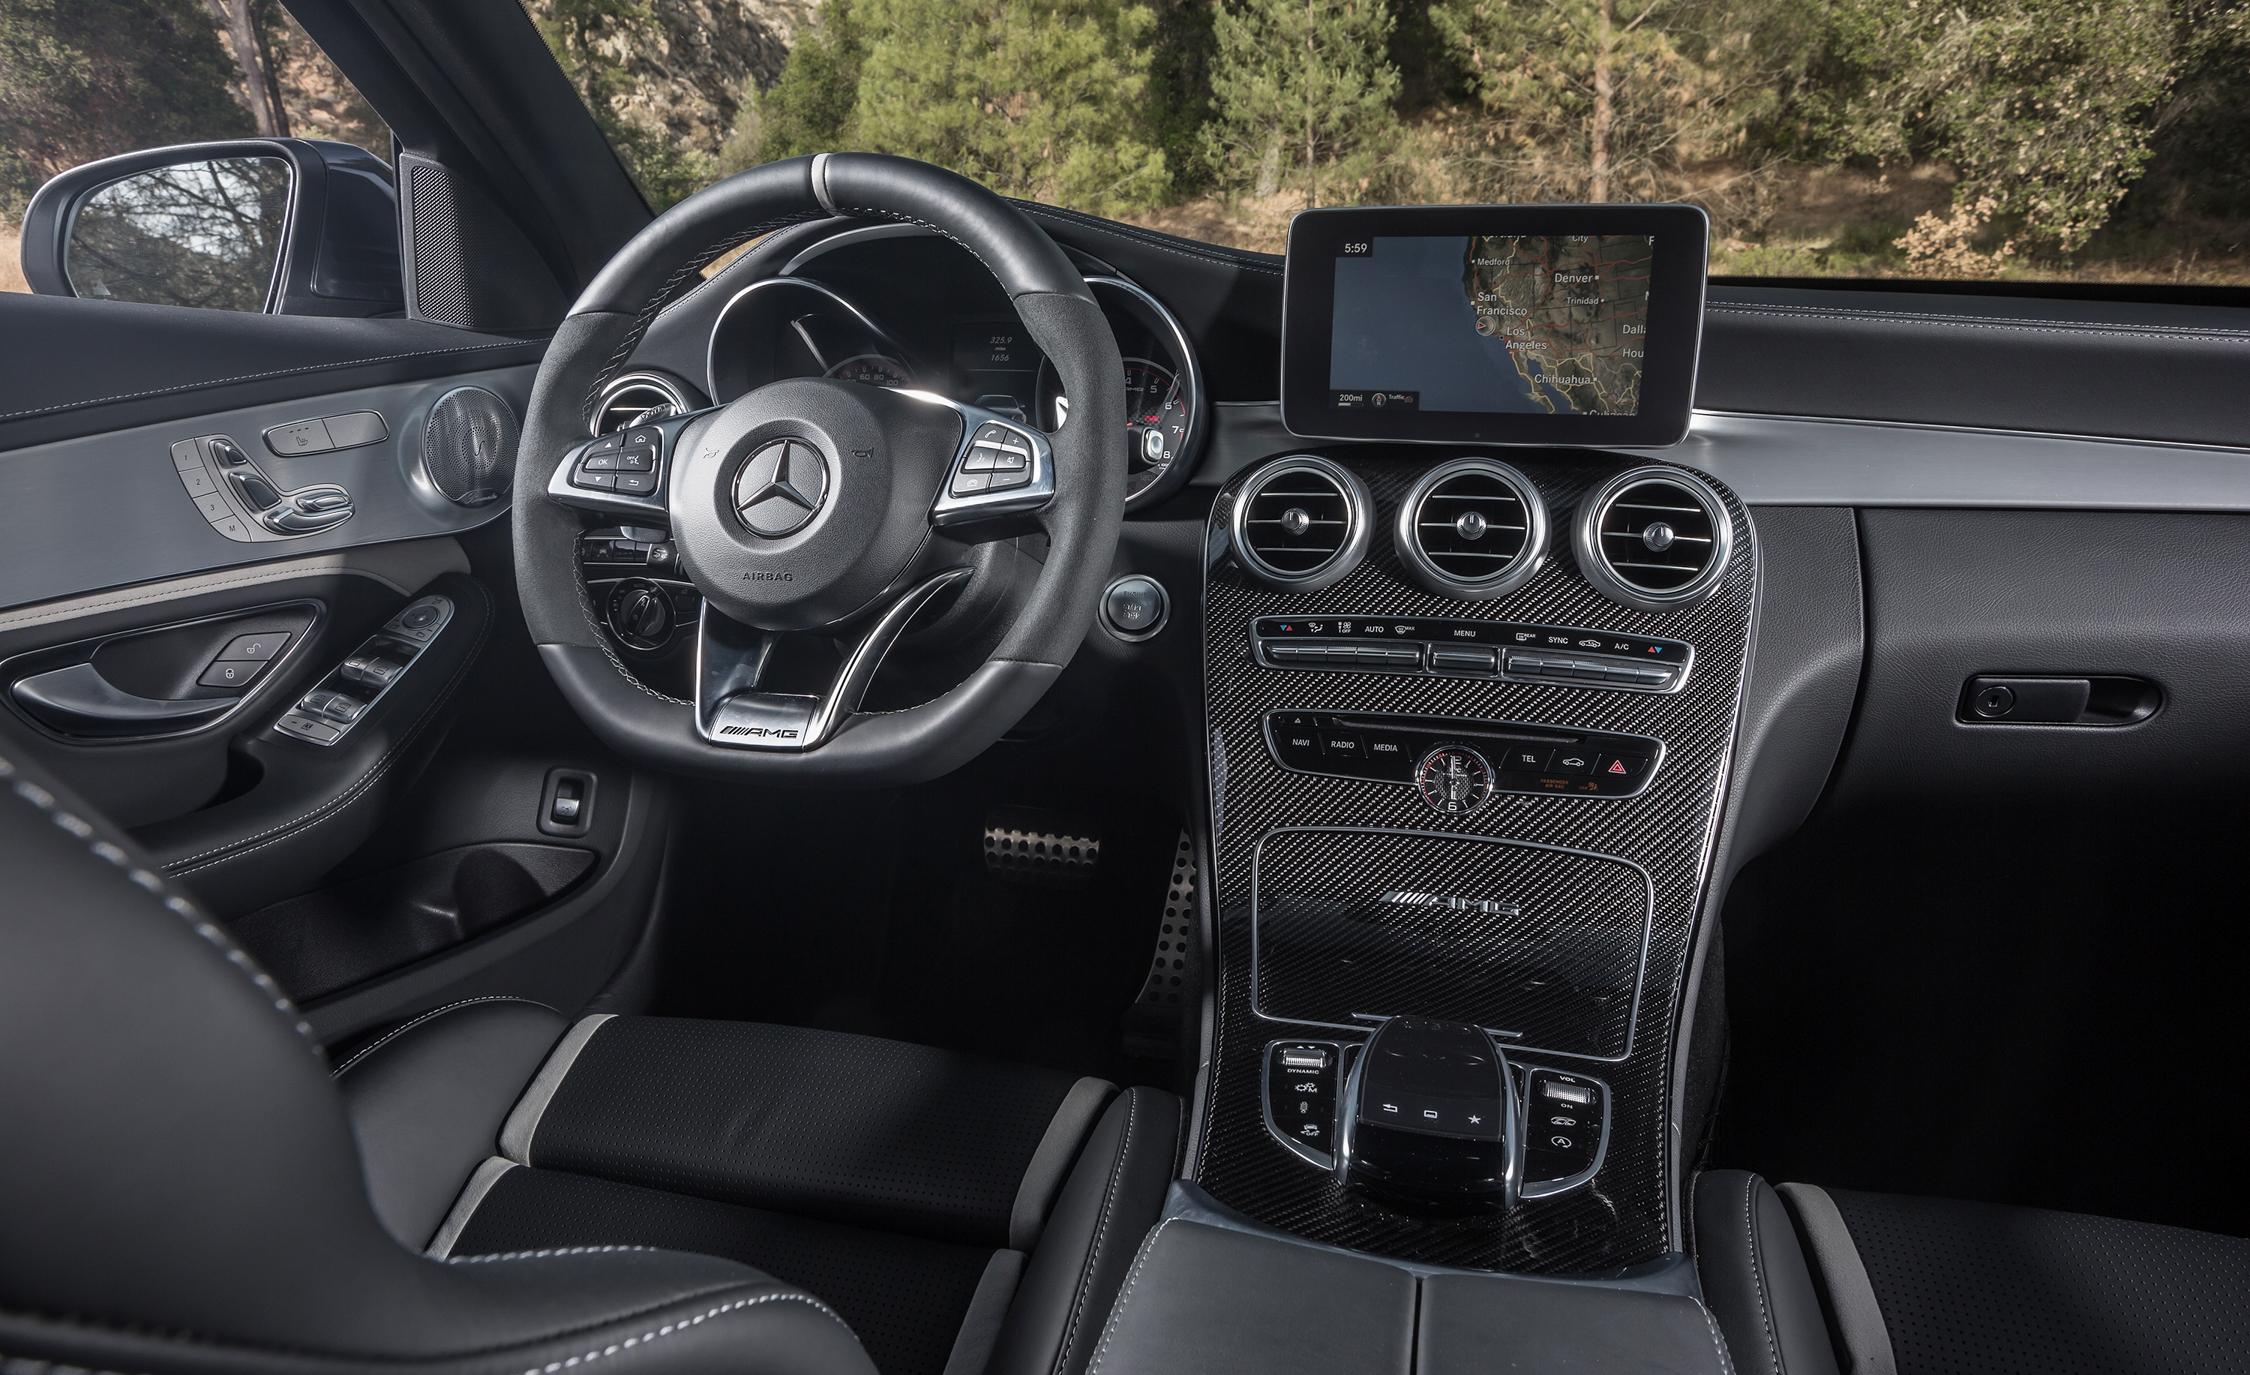 2015 Mercedes-AMG C63 S-Model Cockpit and Dashboard